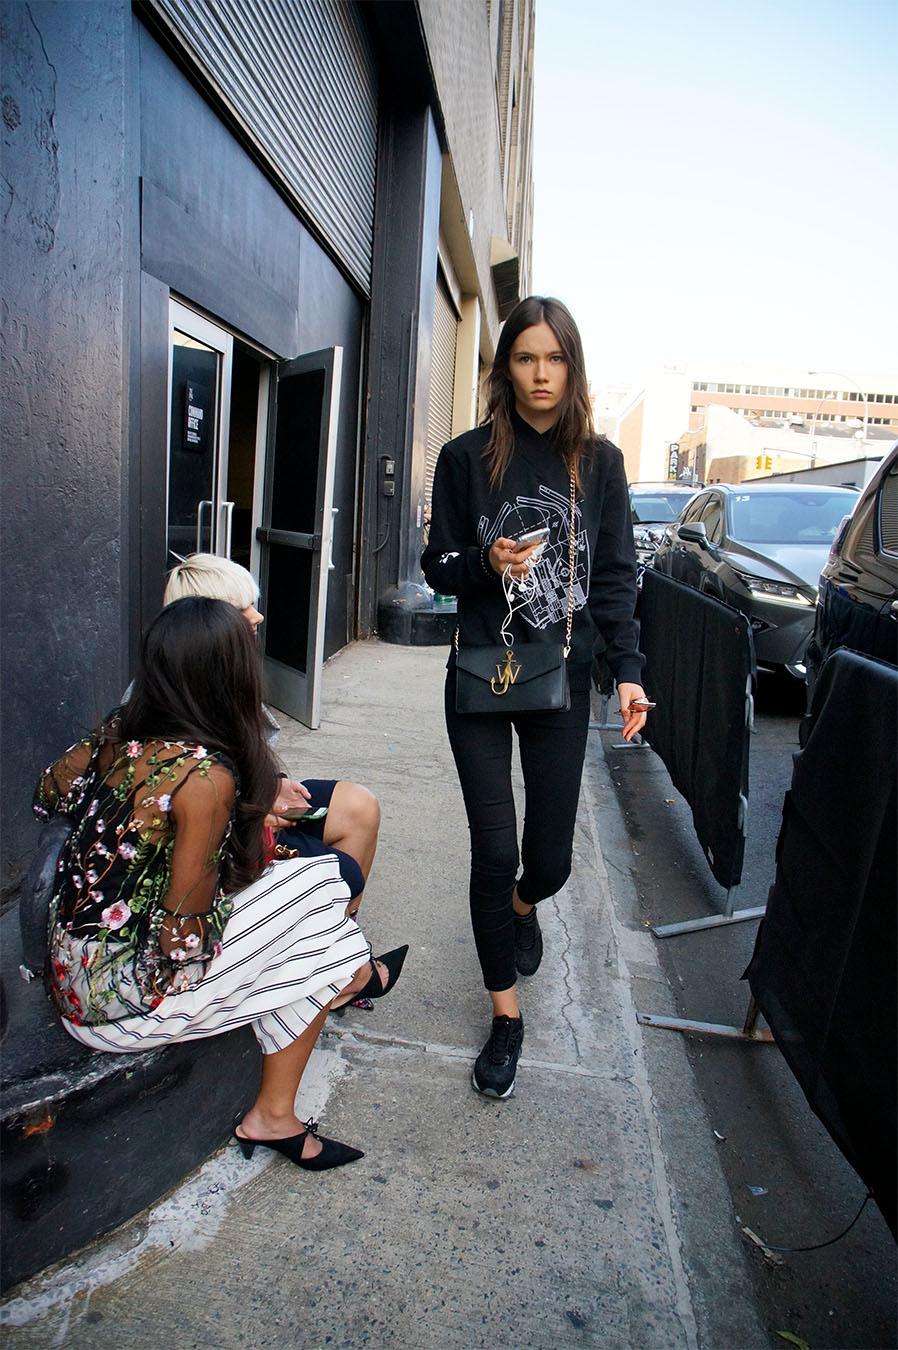 Noa_Baker_street_fashion_photography_new_york_thin_model